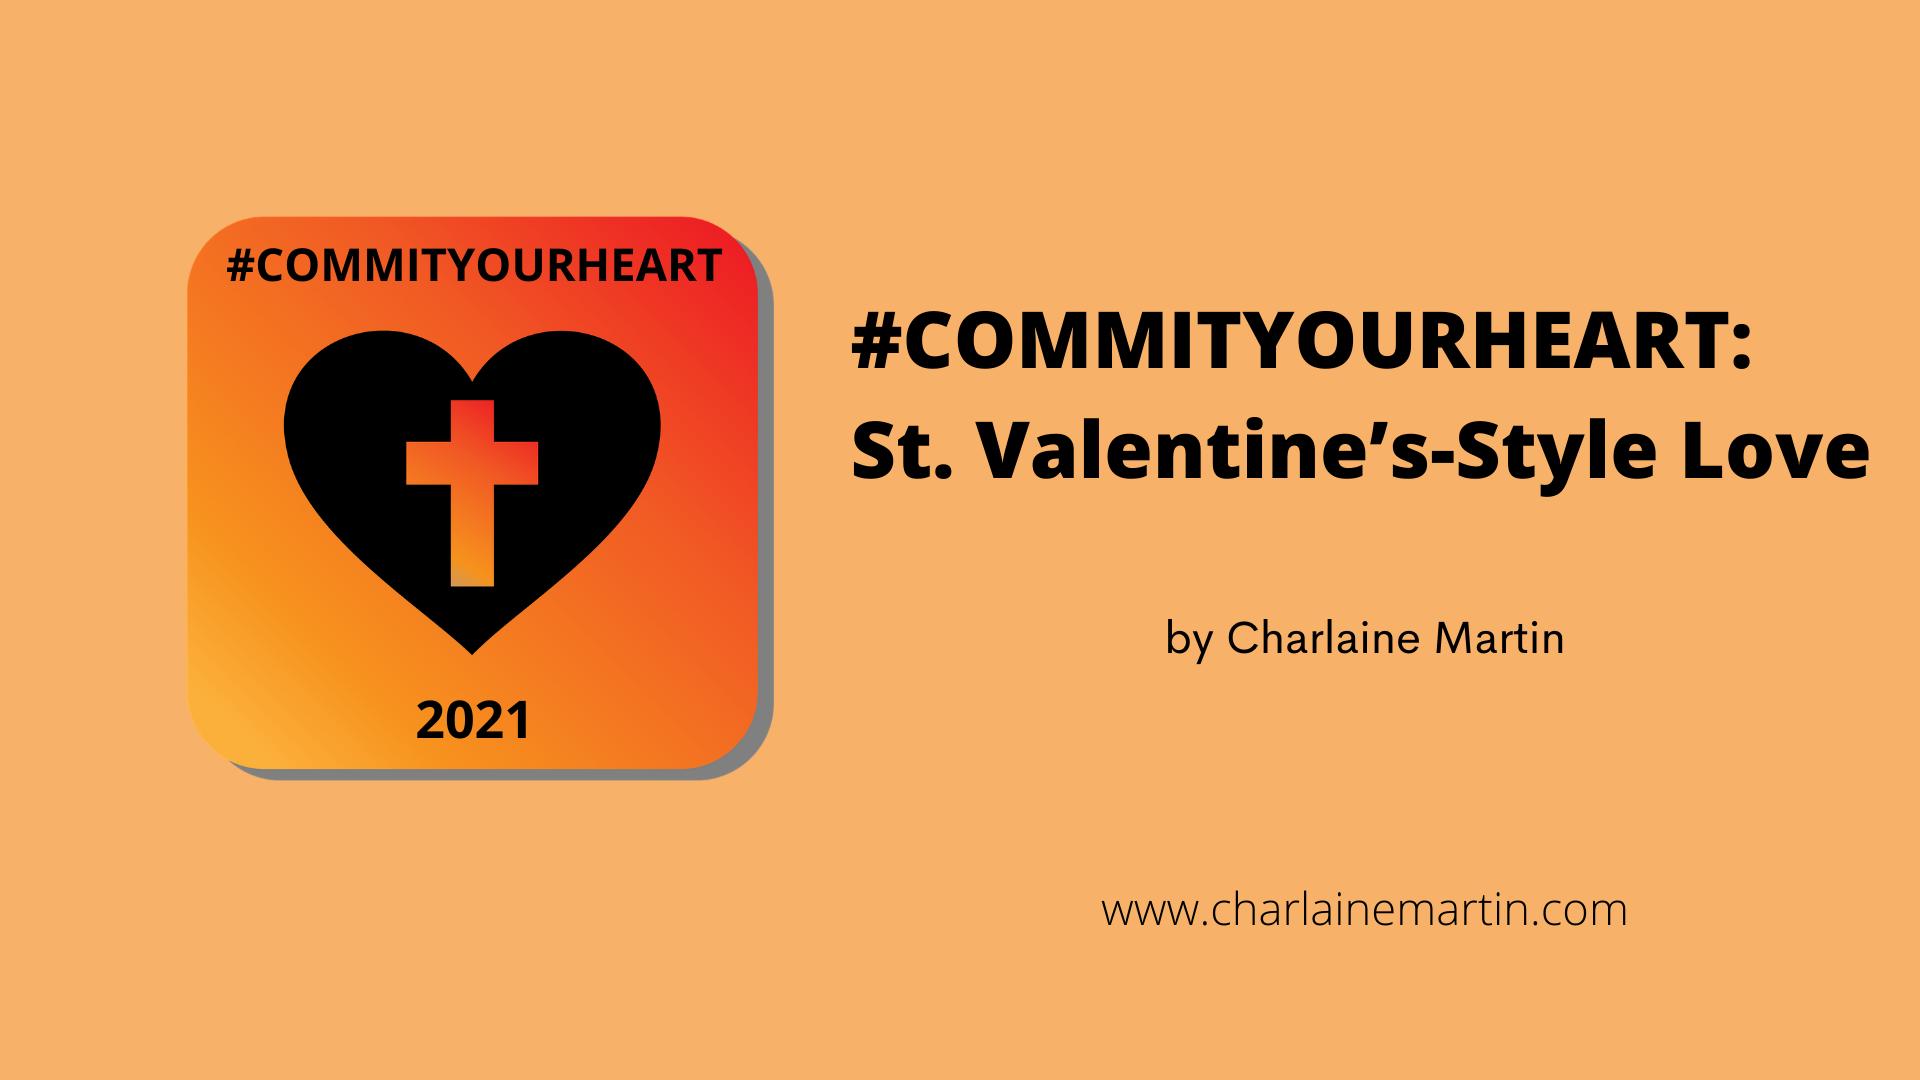 #COMMITYOURHEART:        St. Valentine's-Style Love